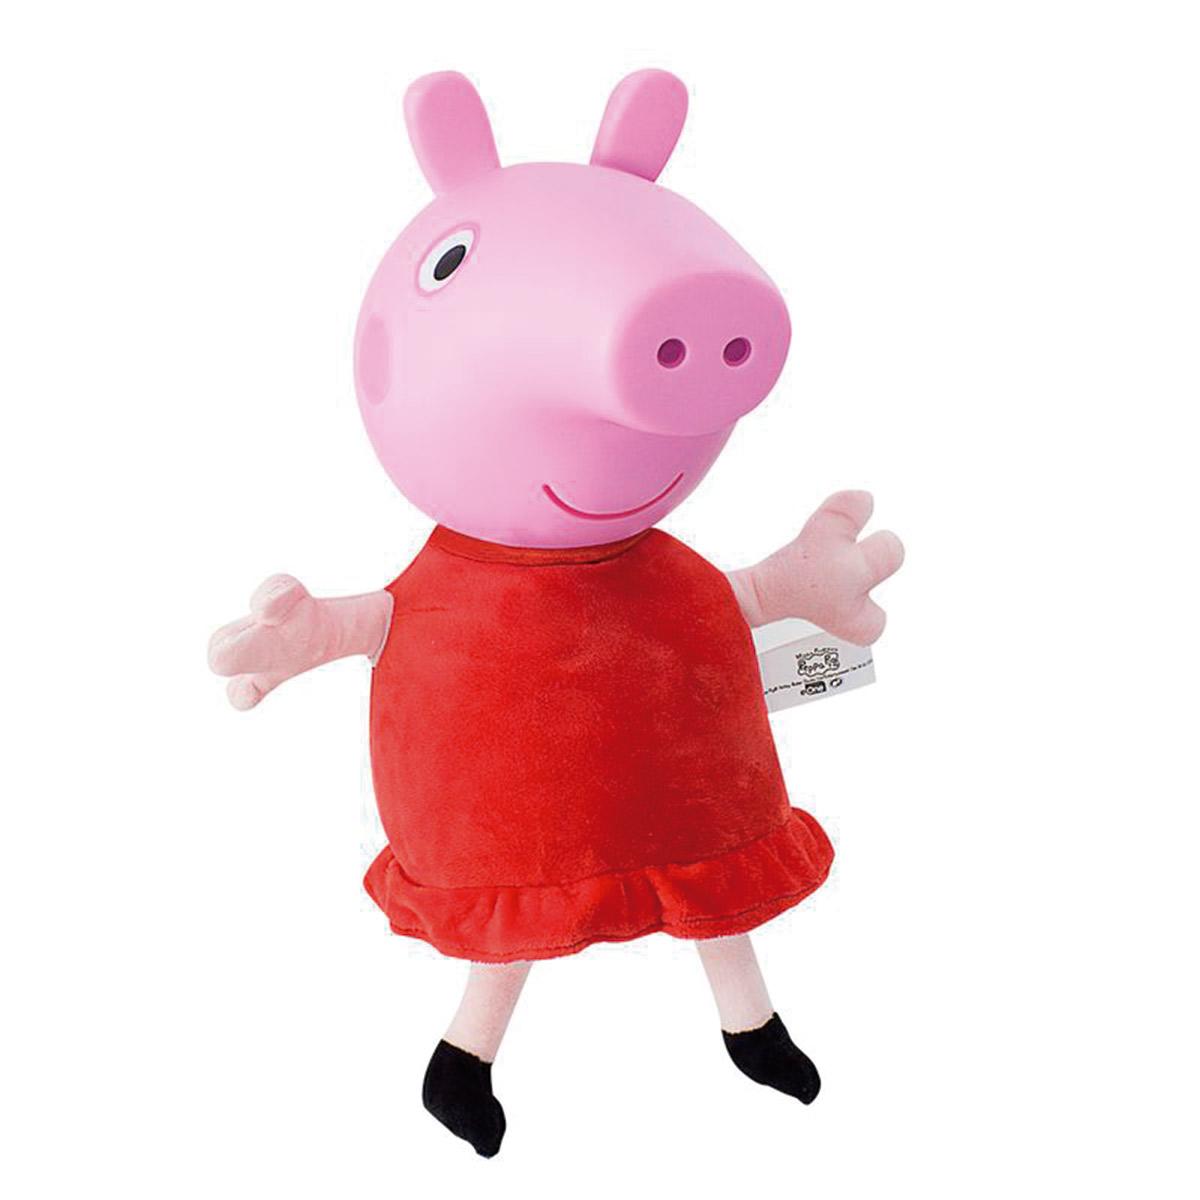 Pelucia Peppa Pig Cabeça De Vinil - Estre